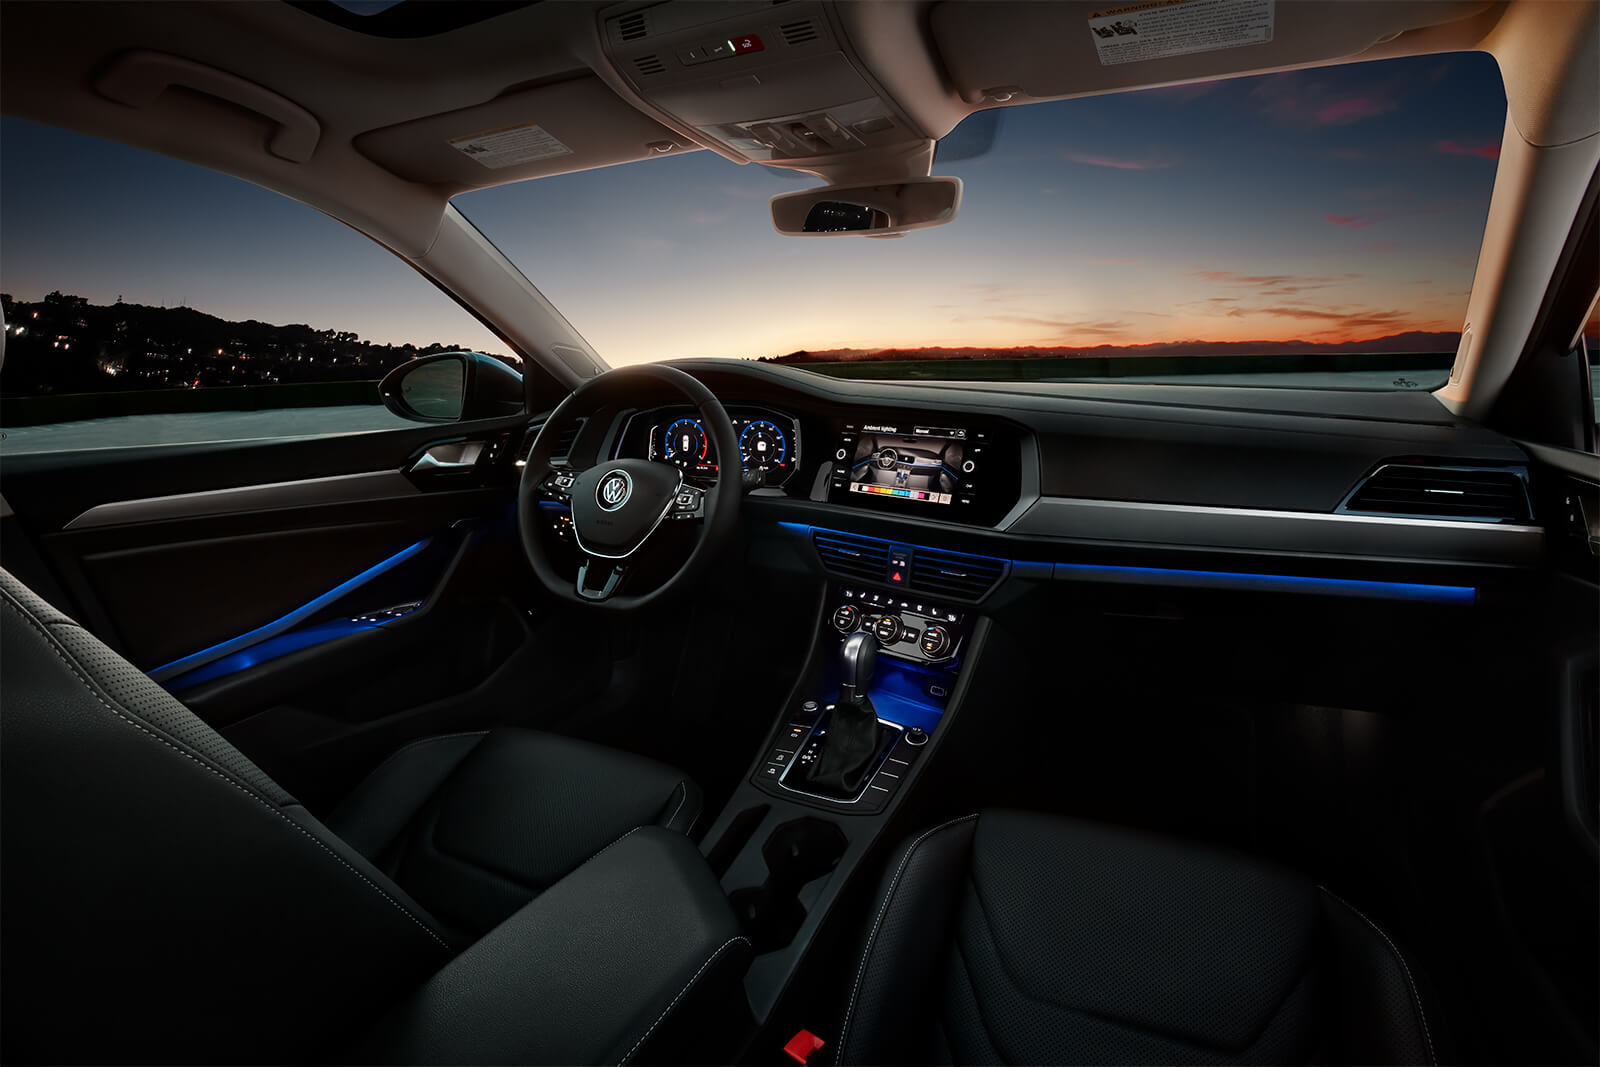 2019 Volkswagen Jetta Interior at Mississauga Volkswagen in Mississauga and Toronto